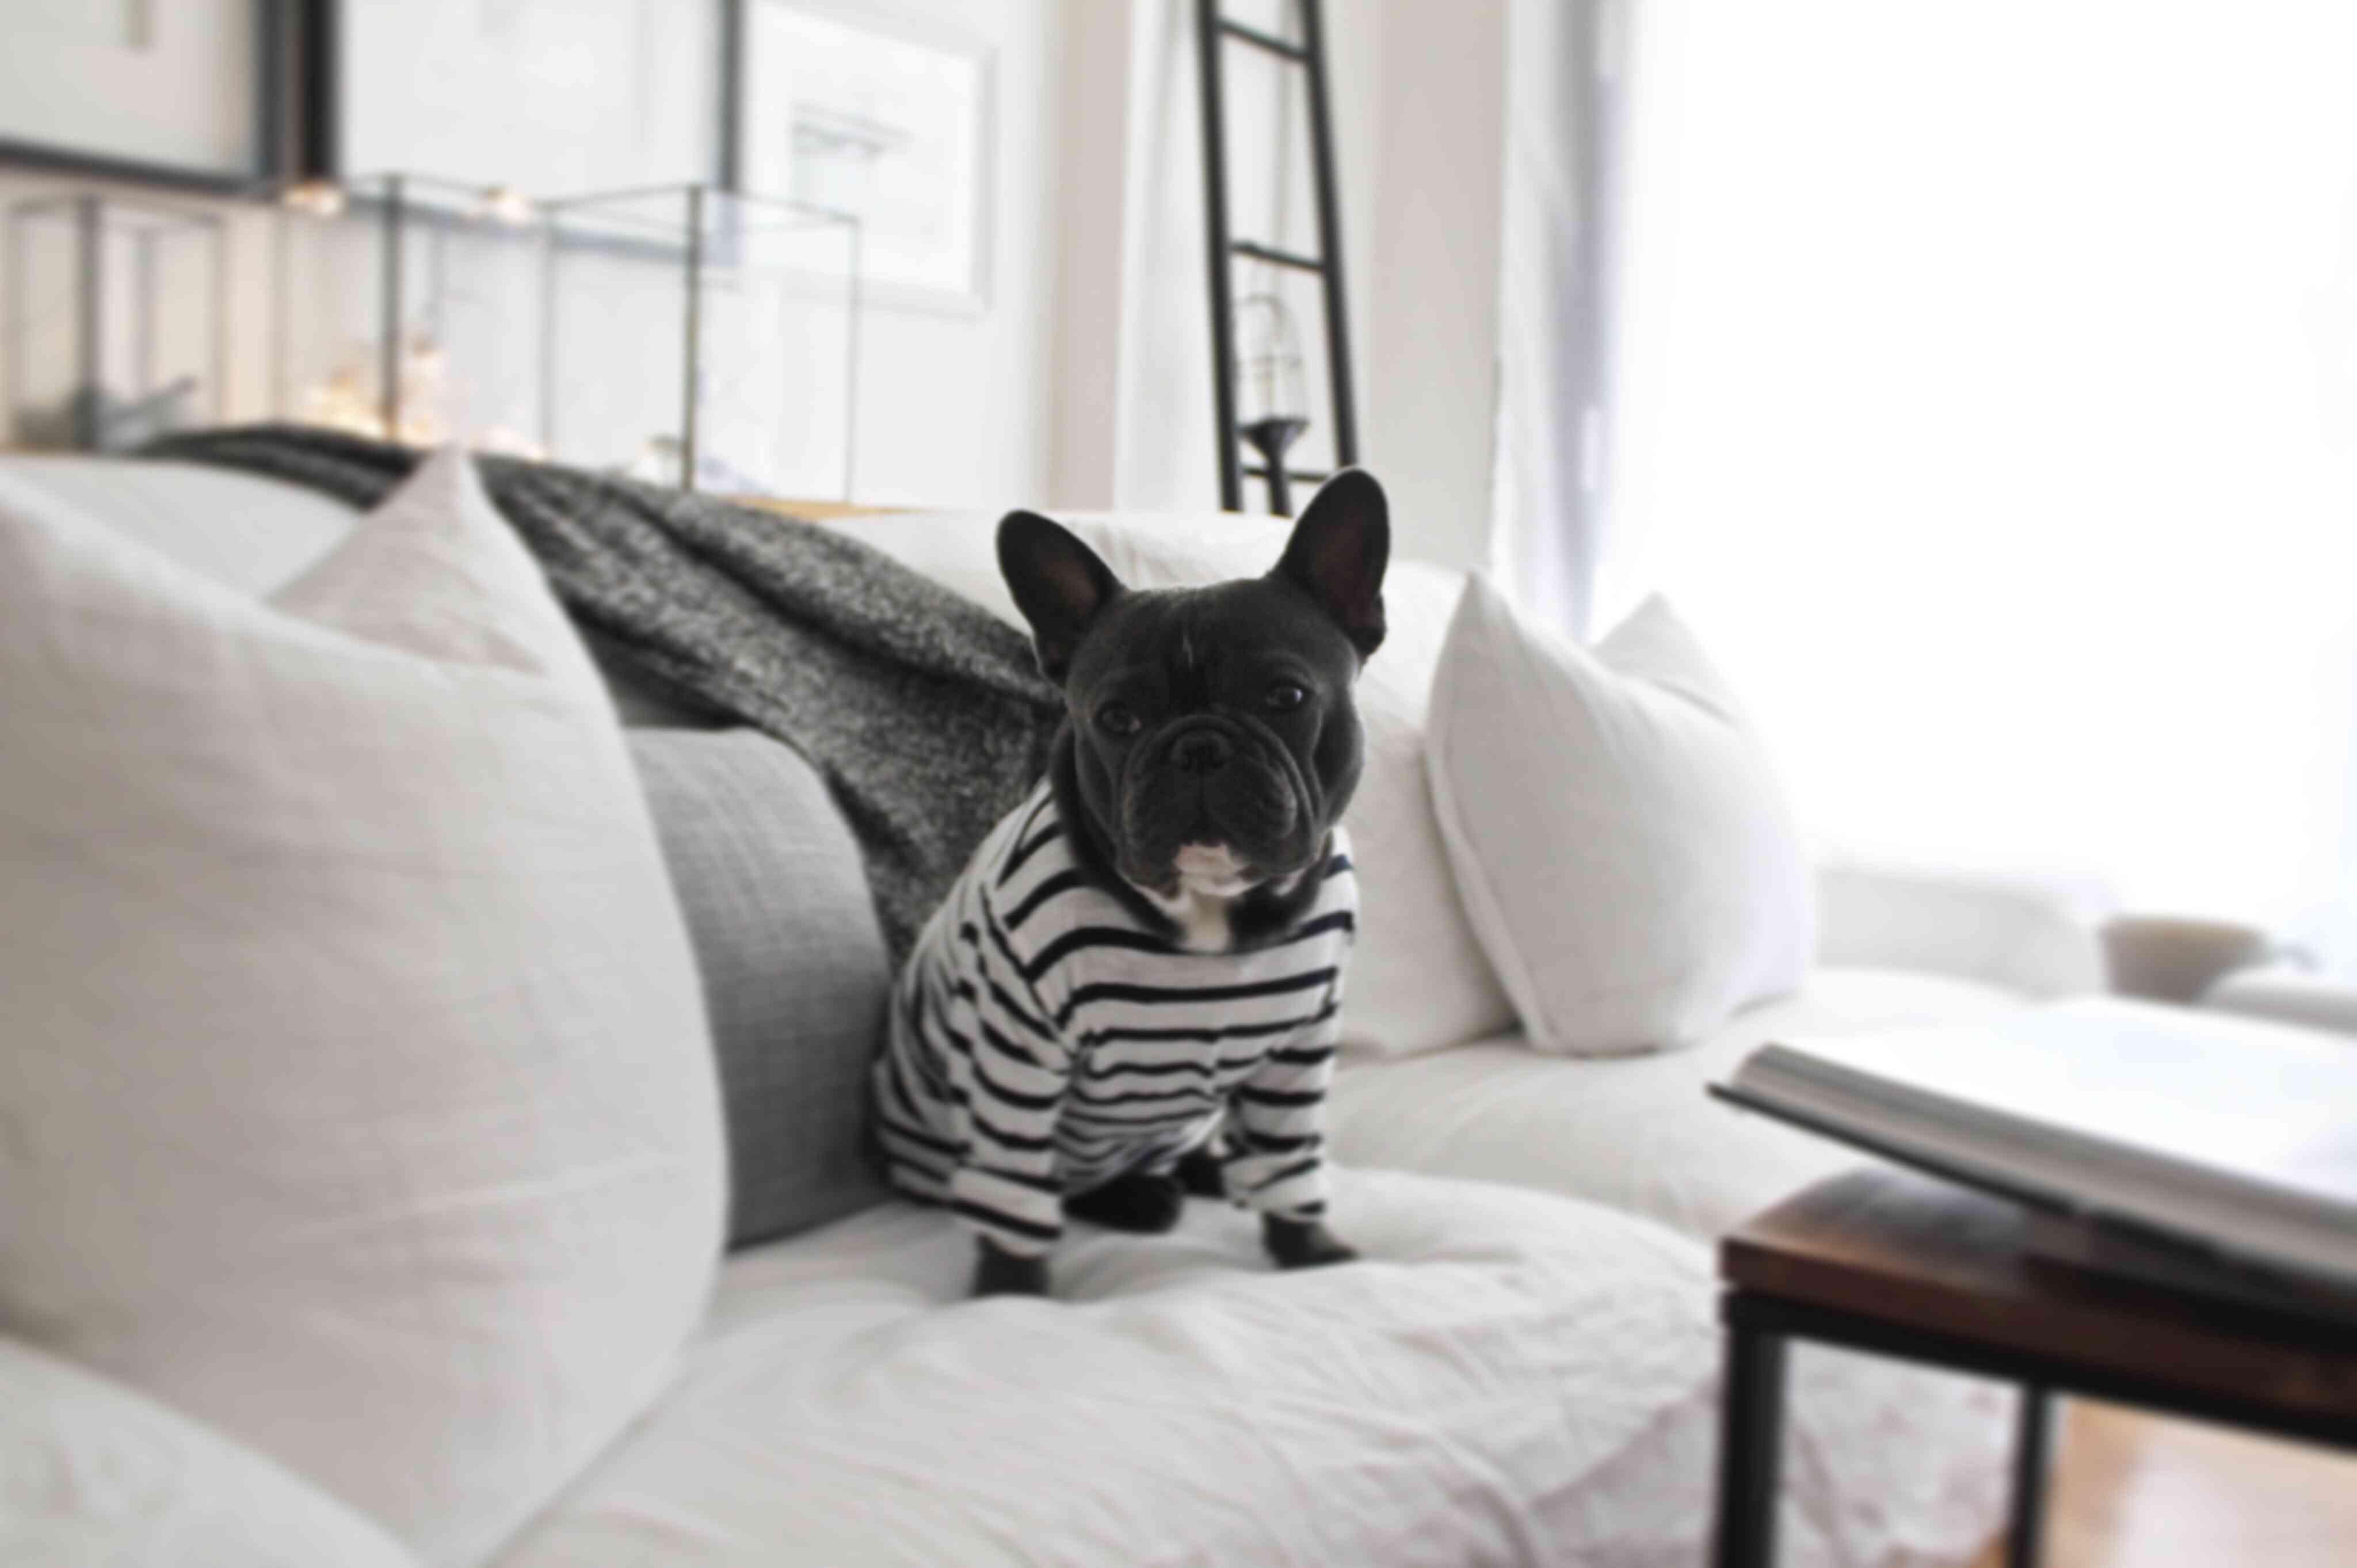 French Bulldog Sitting On Sofa At Home